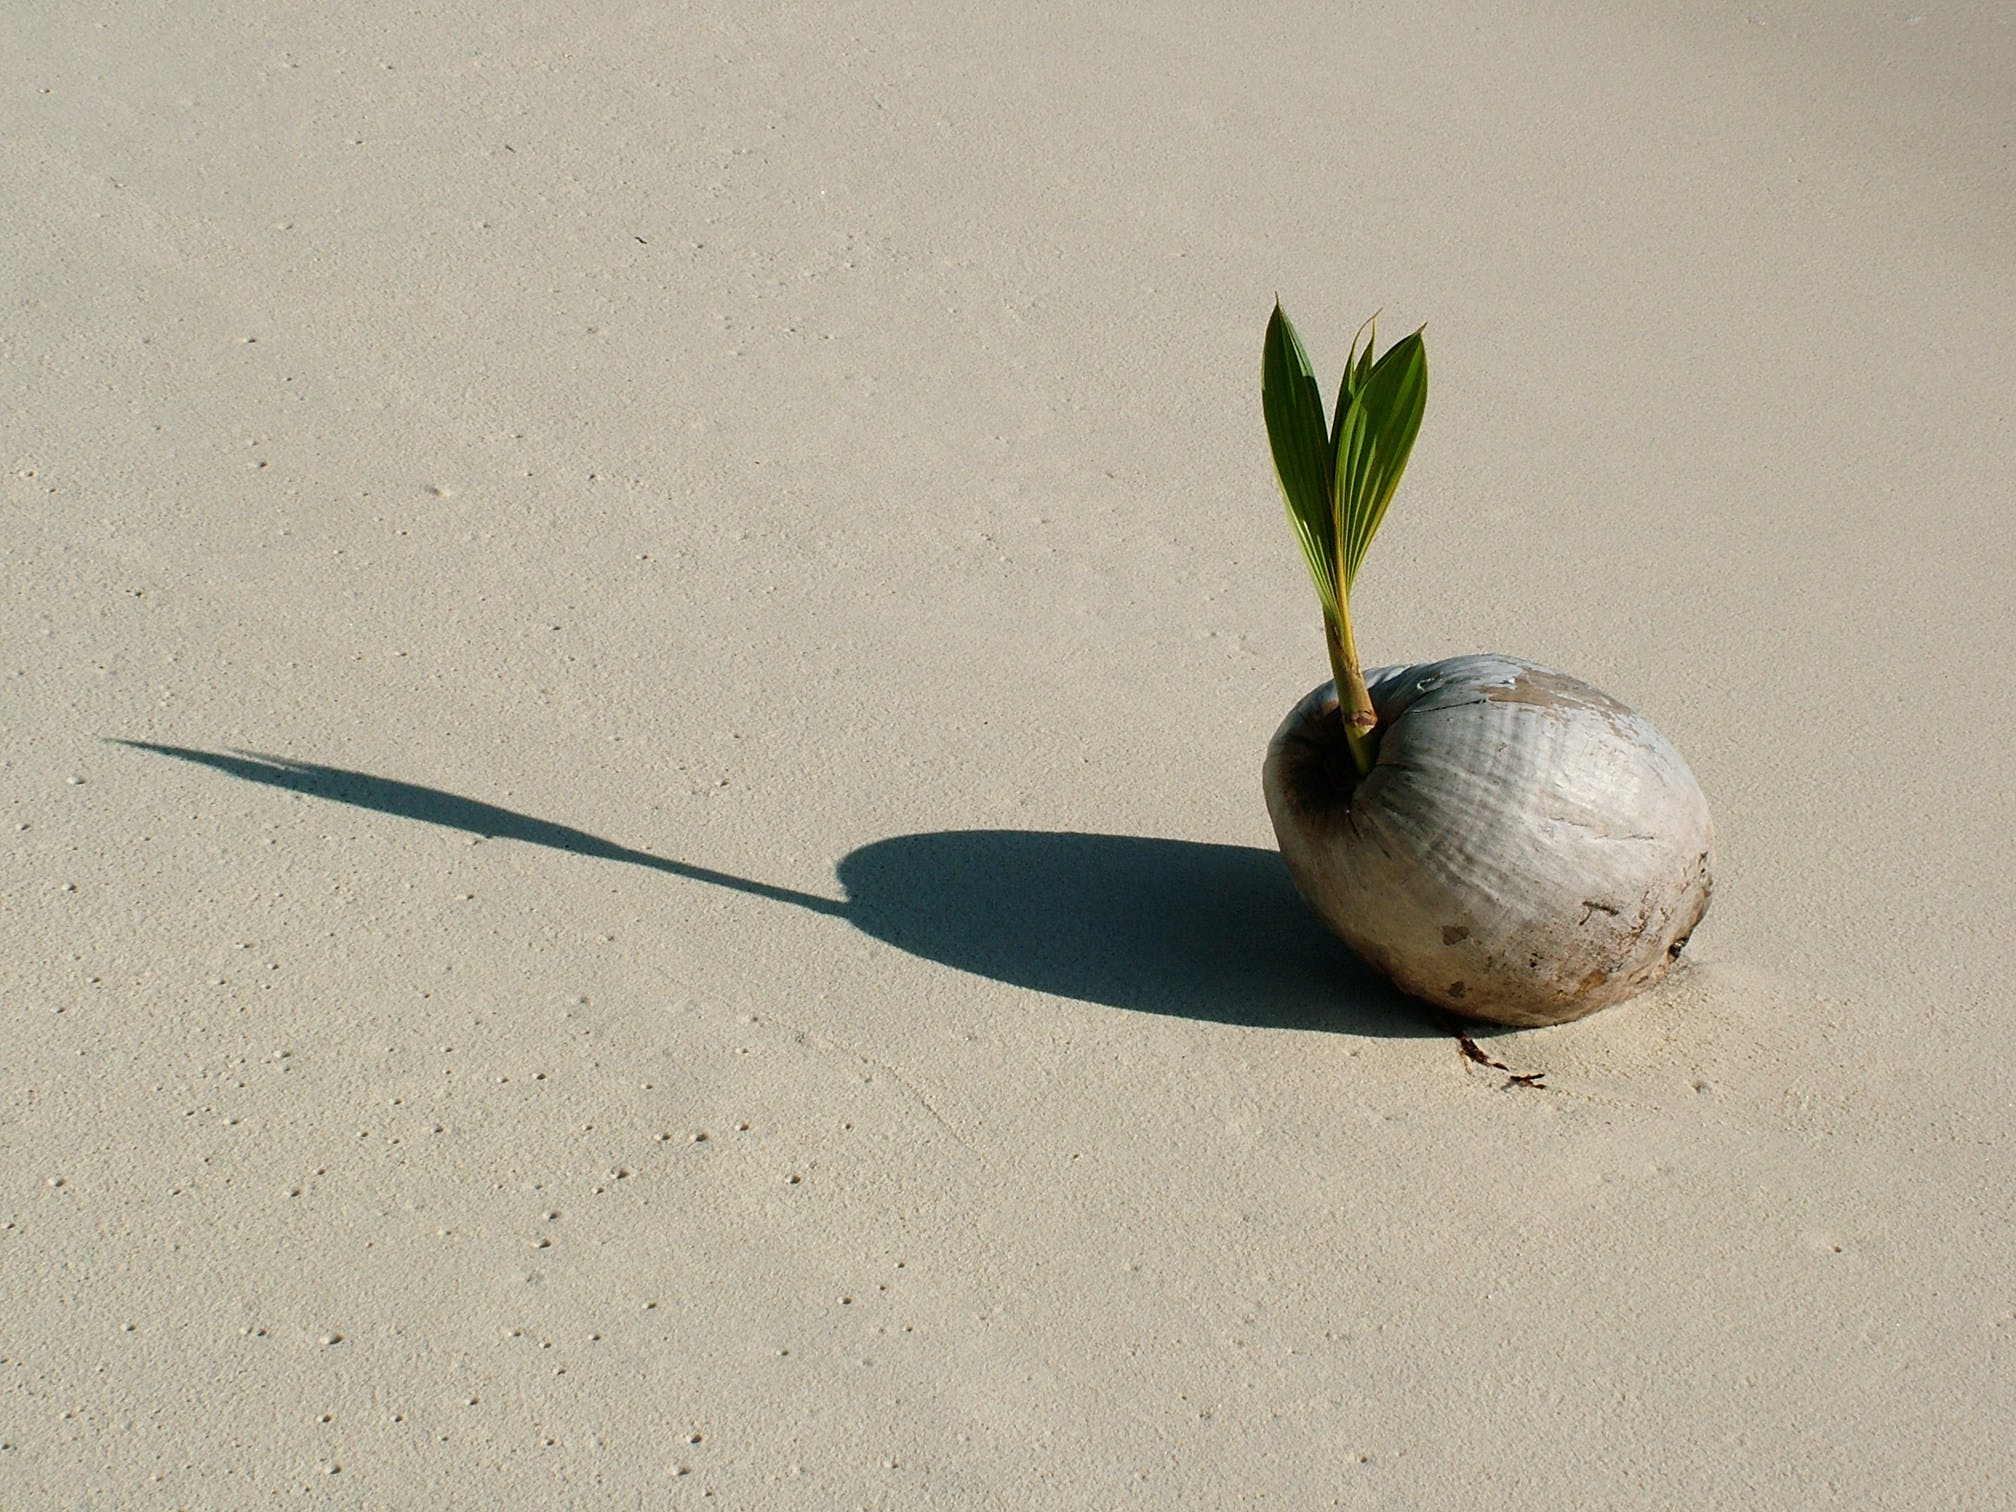 Free stock photo of coconut